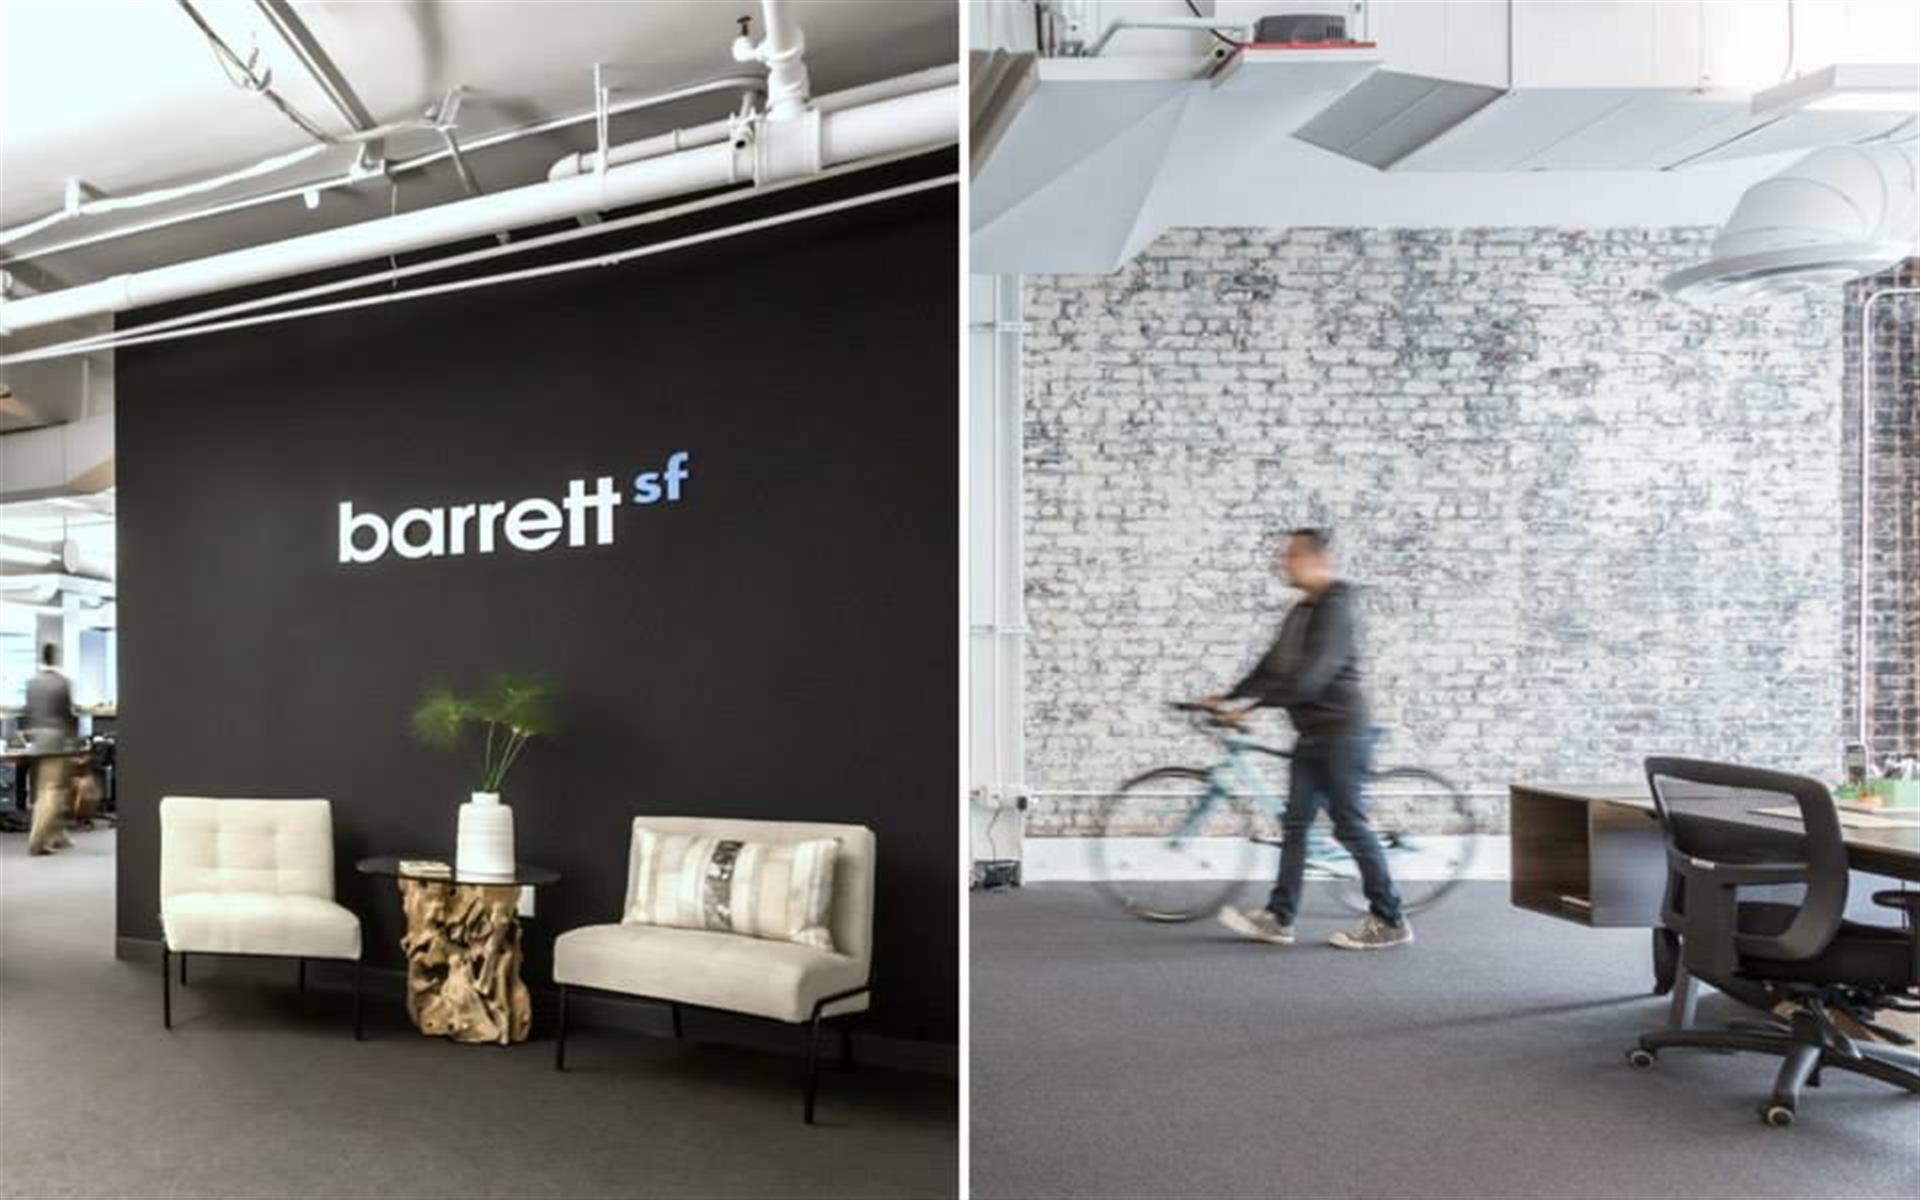 barrettSF - Dedicated Desk 1